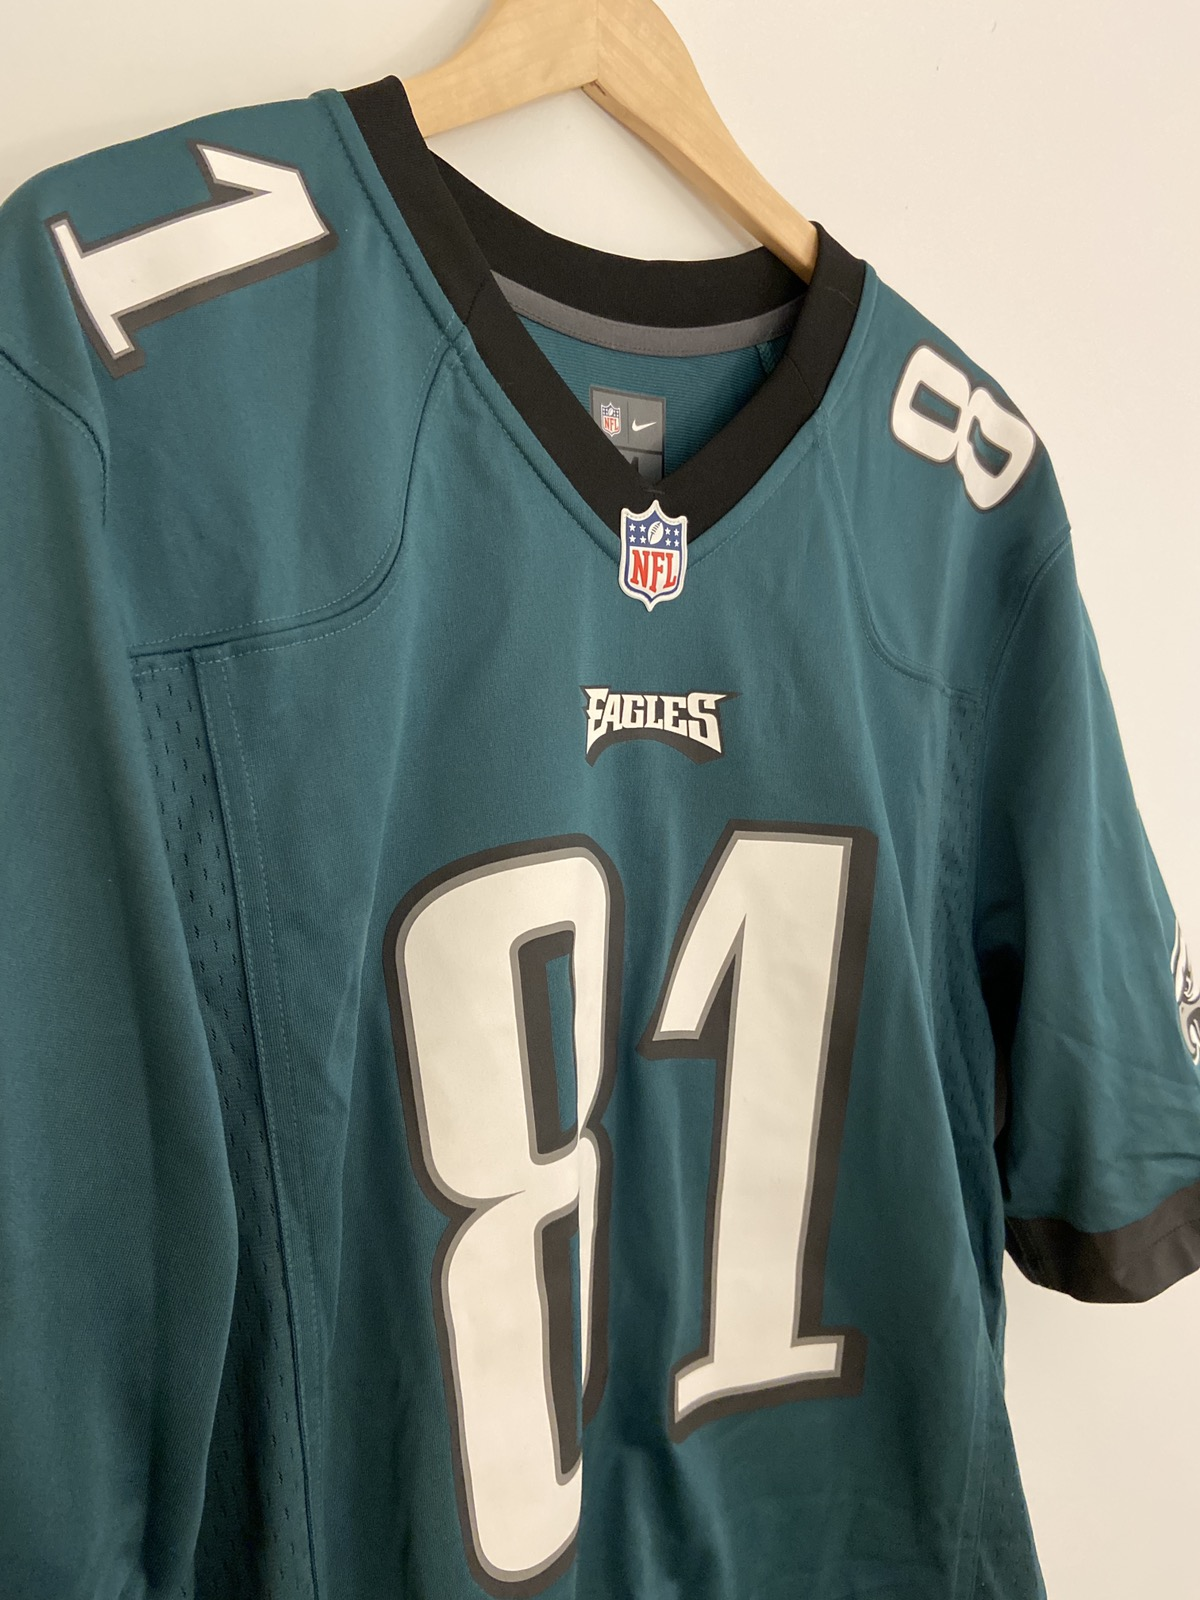 Nike Nike Philadelphia Eagles Jordan Matthews NFL Jersey